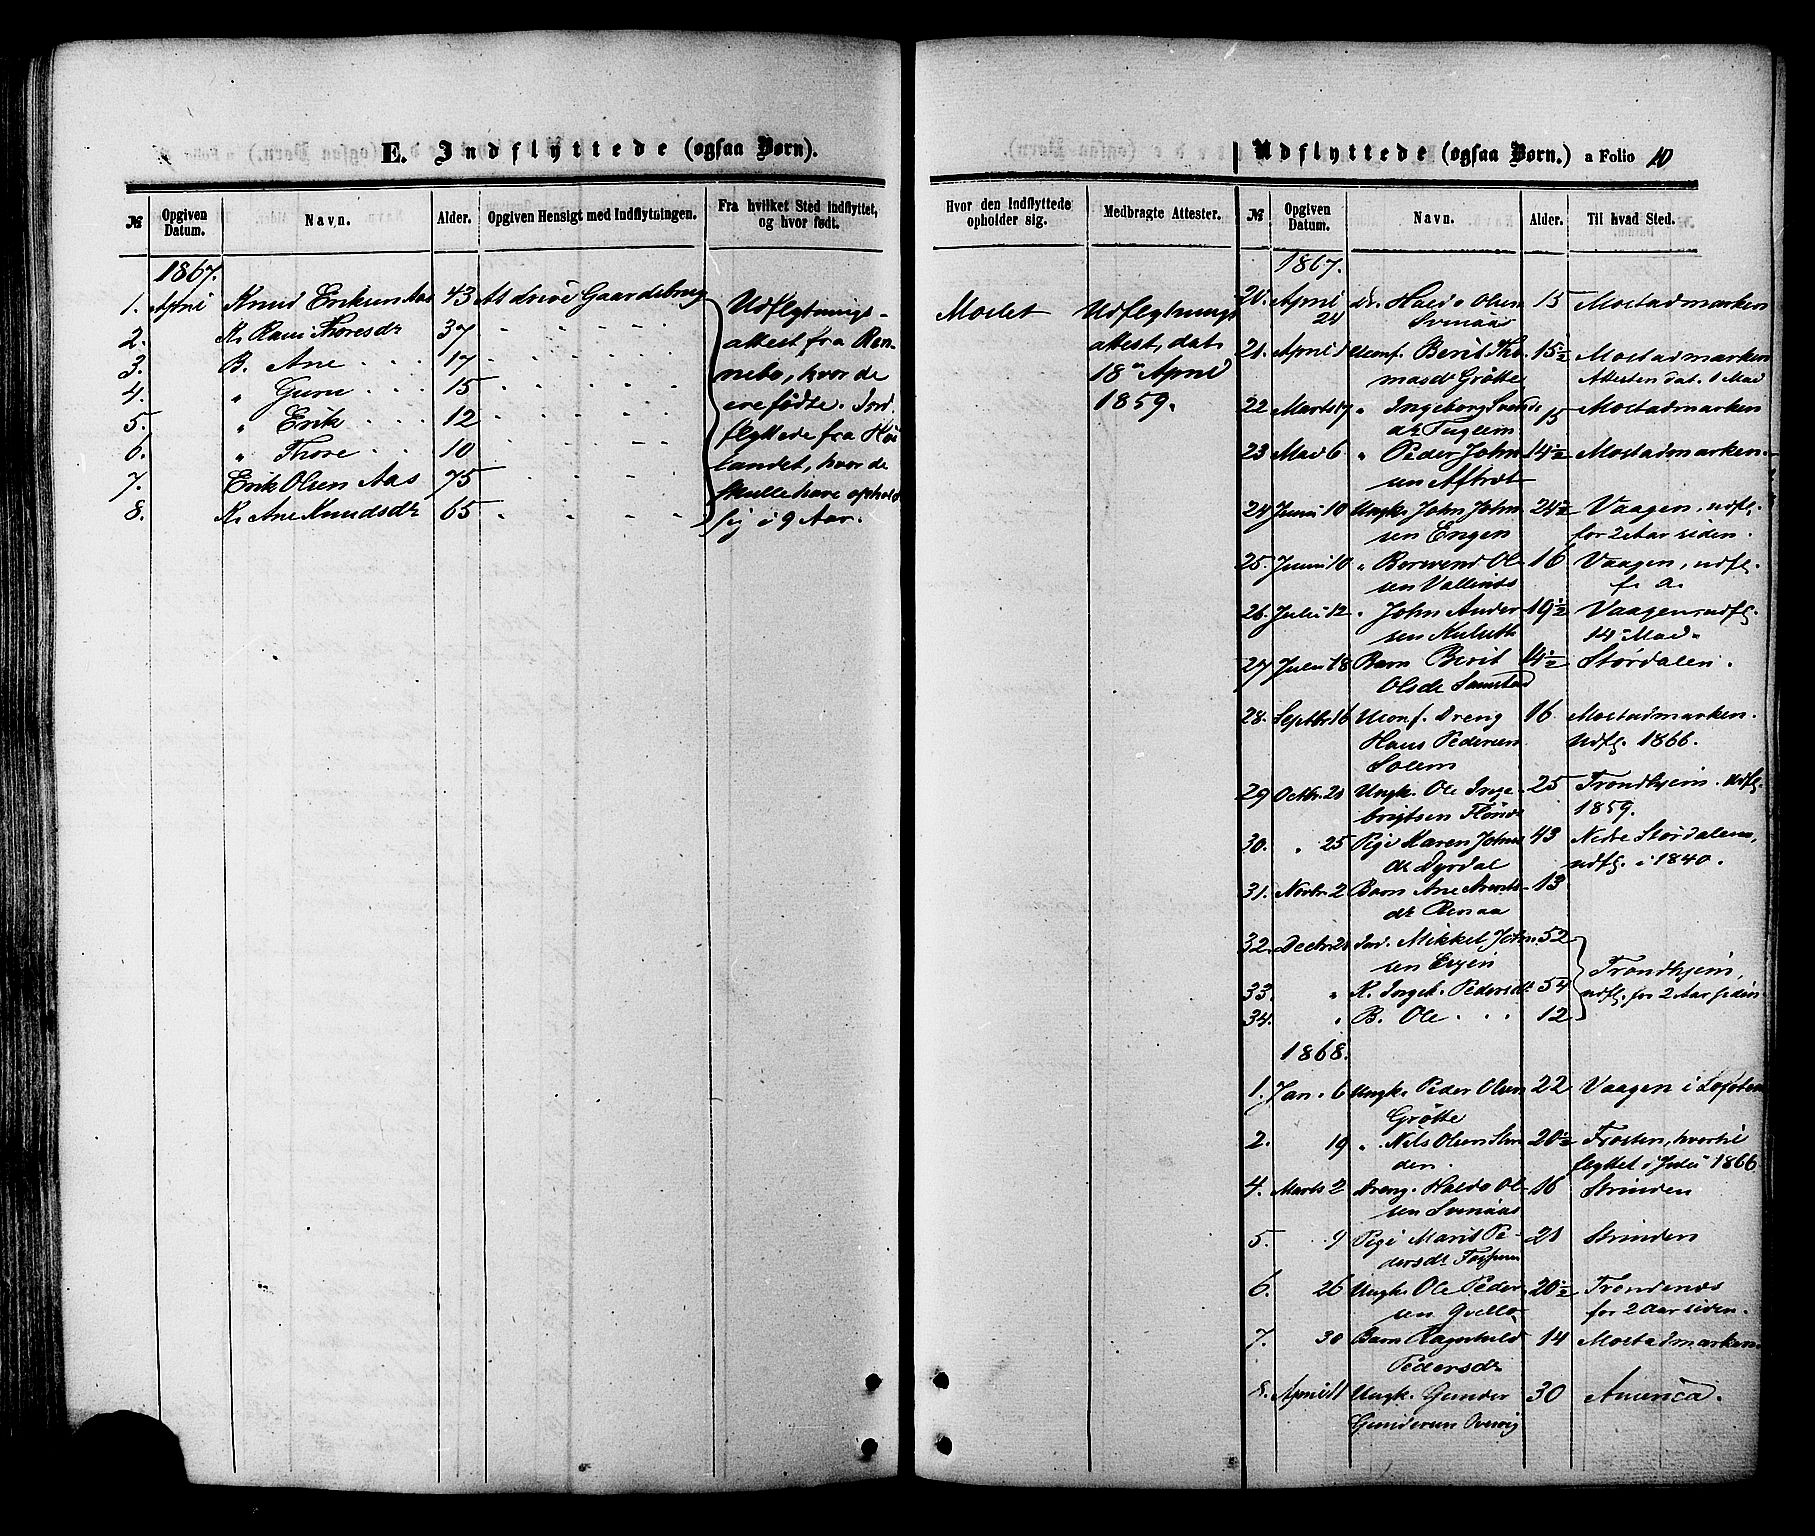 SAT, Ministerialprotokoller, klokkerbøker og fødselsregistre - Sør-Trøndelag, 695/L1147: Parish register (official) no. 695A07, 1860-1877, p. 10